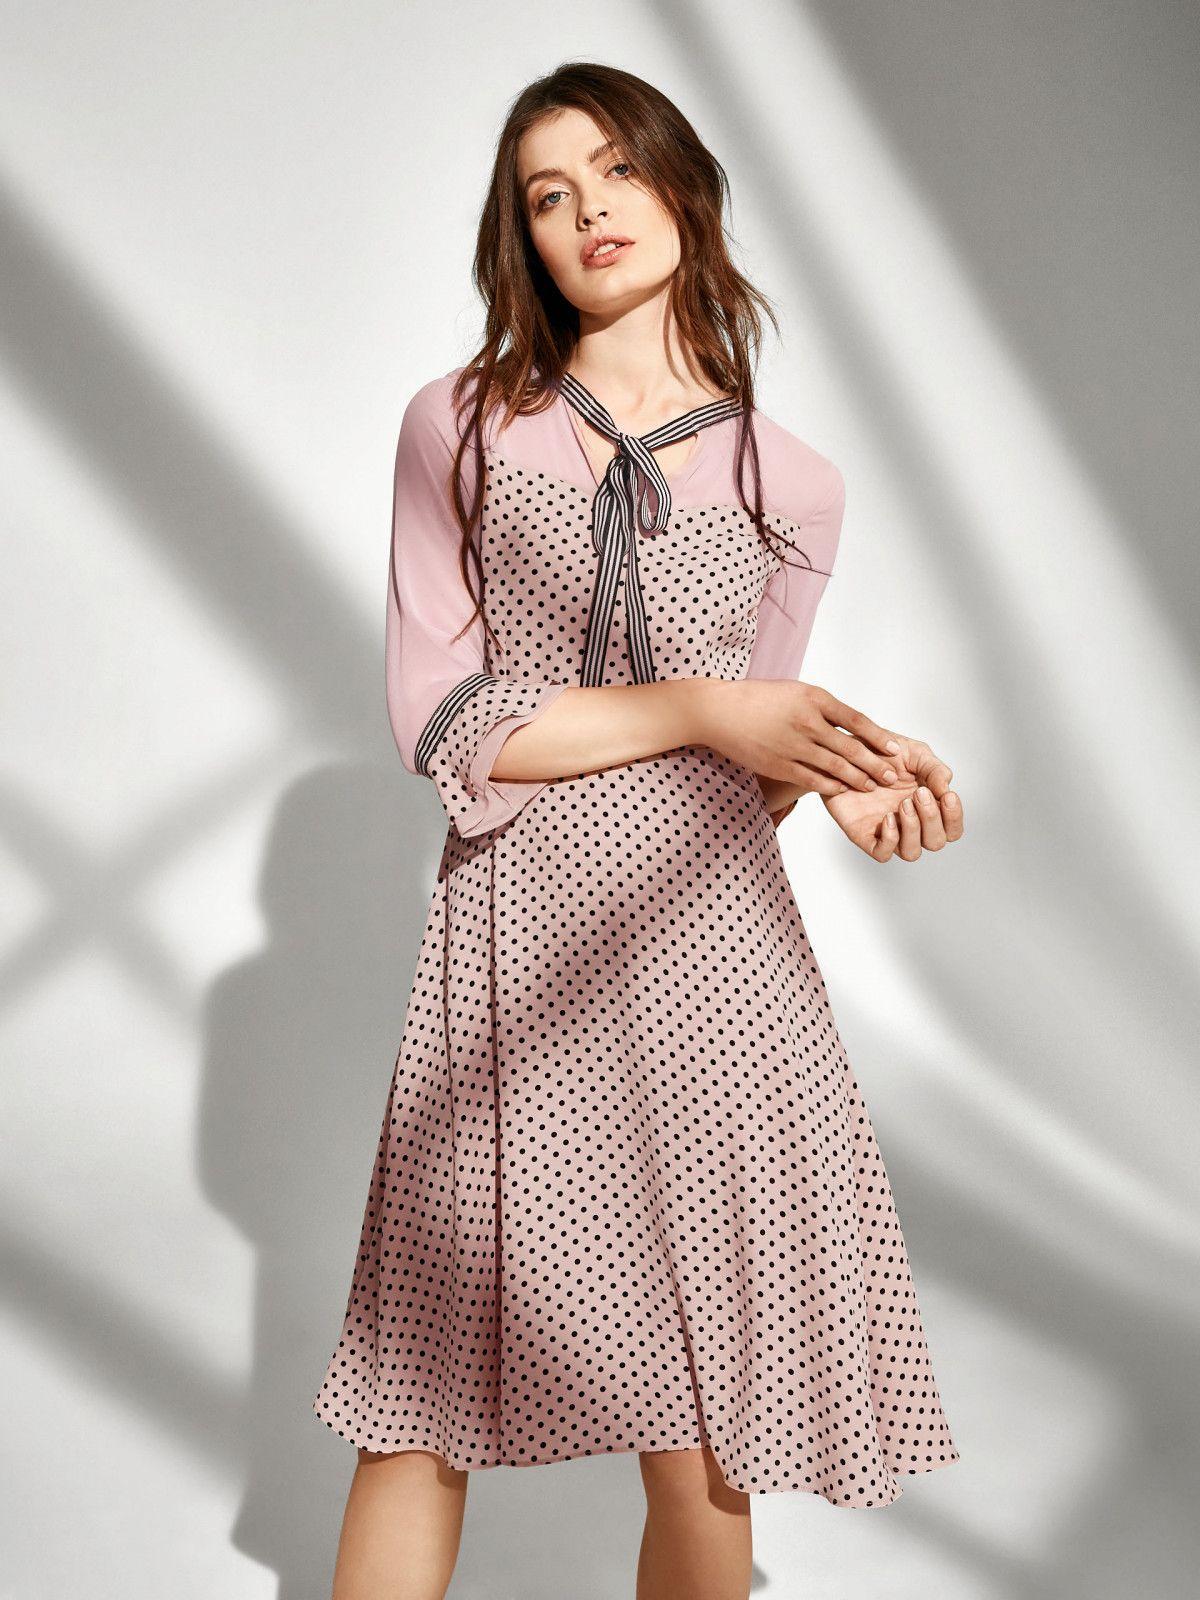 b1f1f55063 Taranko Spring 2019 Pink dress Ubrania Na Wiosnę